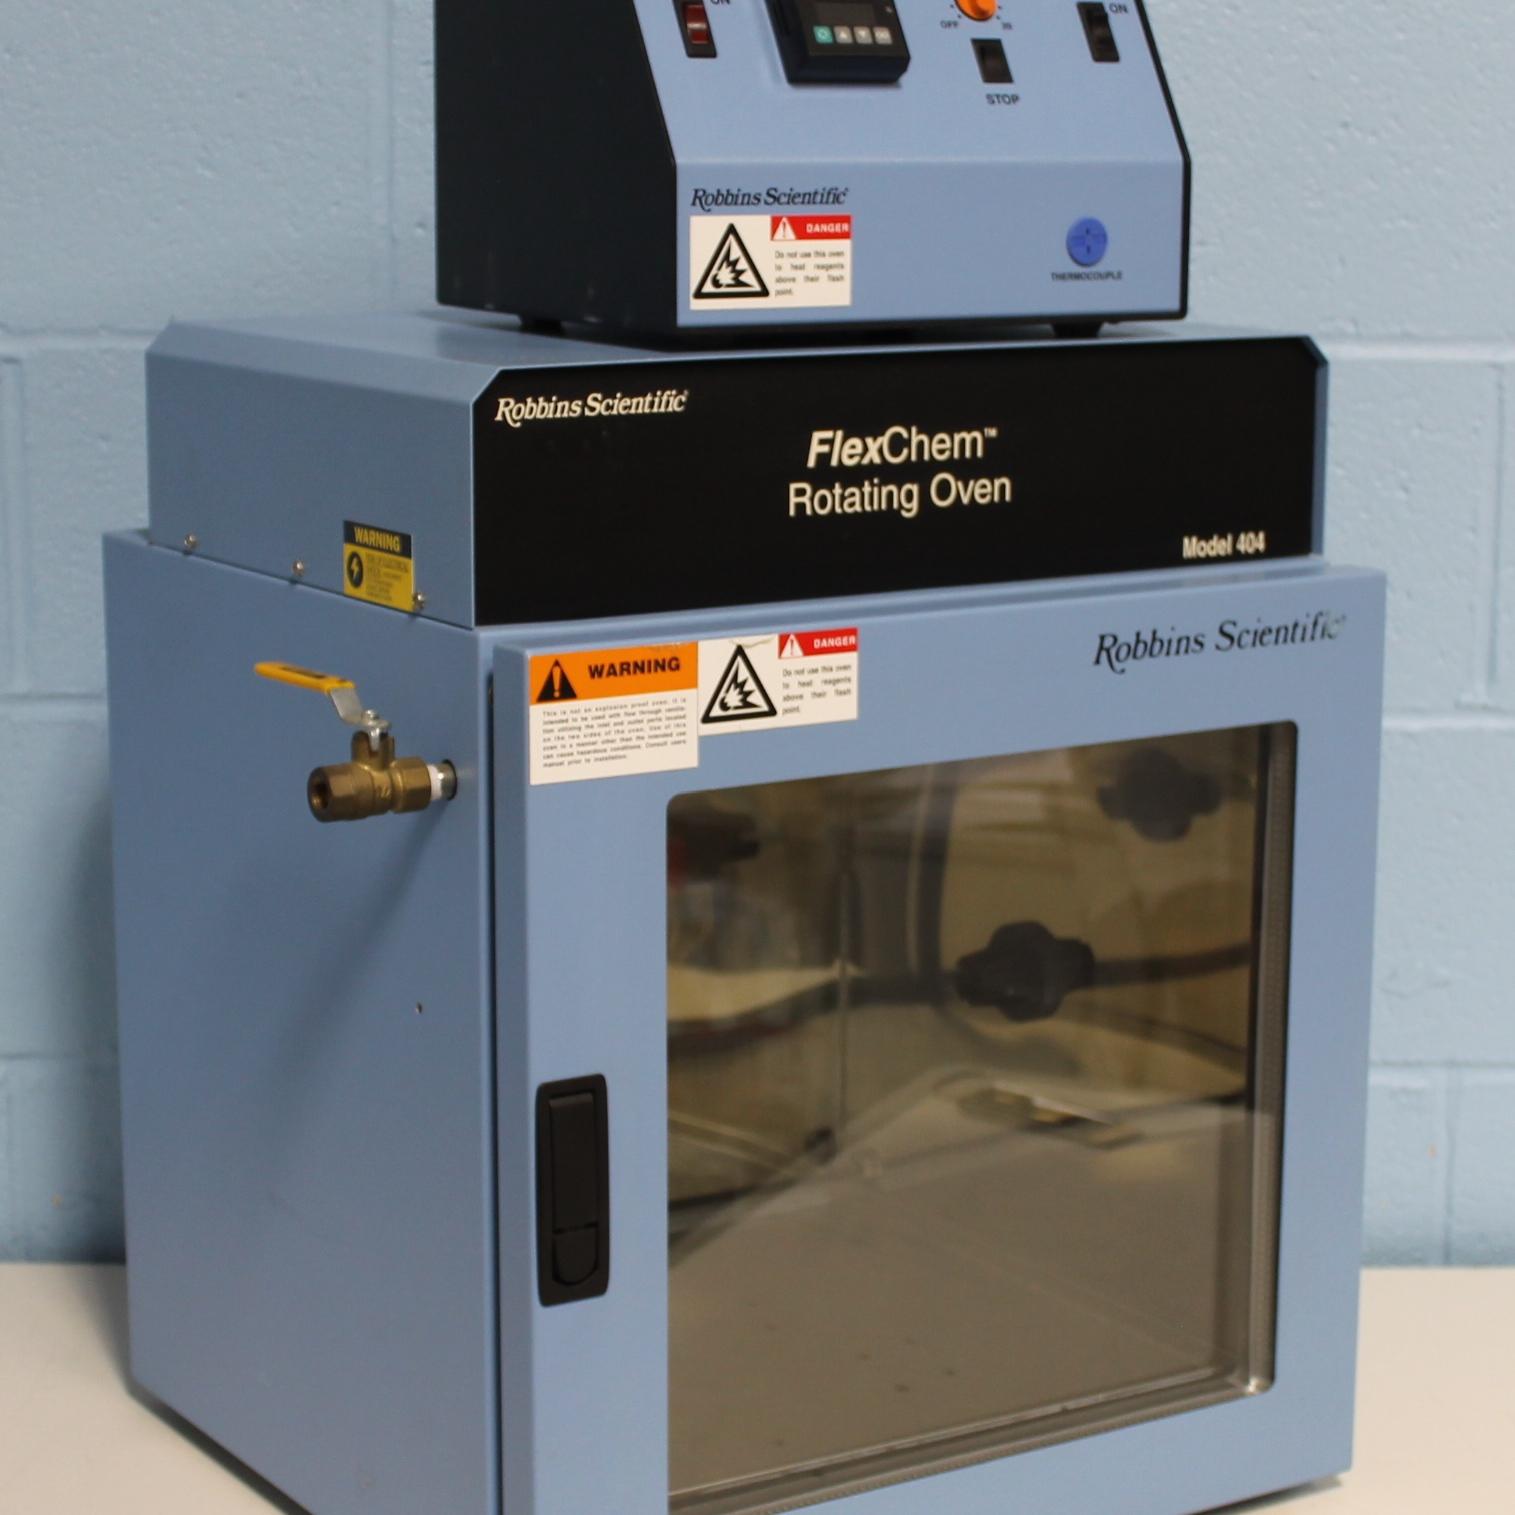 Robbins Scientific Flexchem Rotating Oven Image